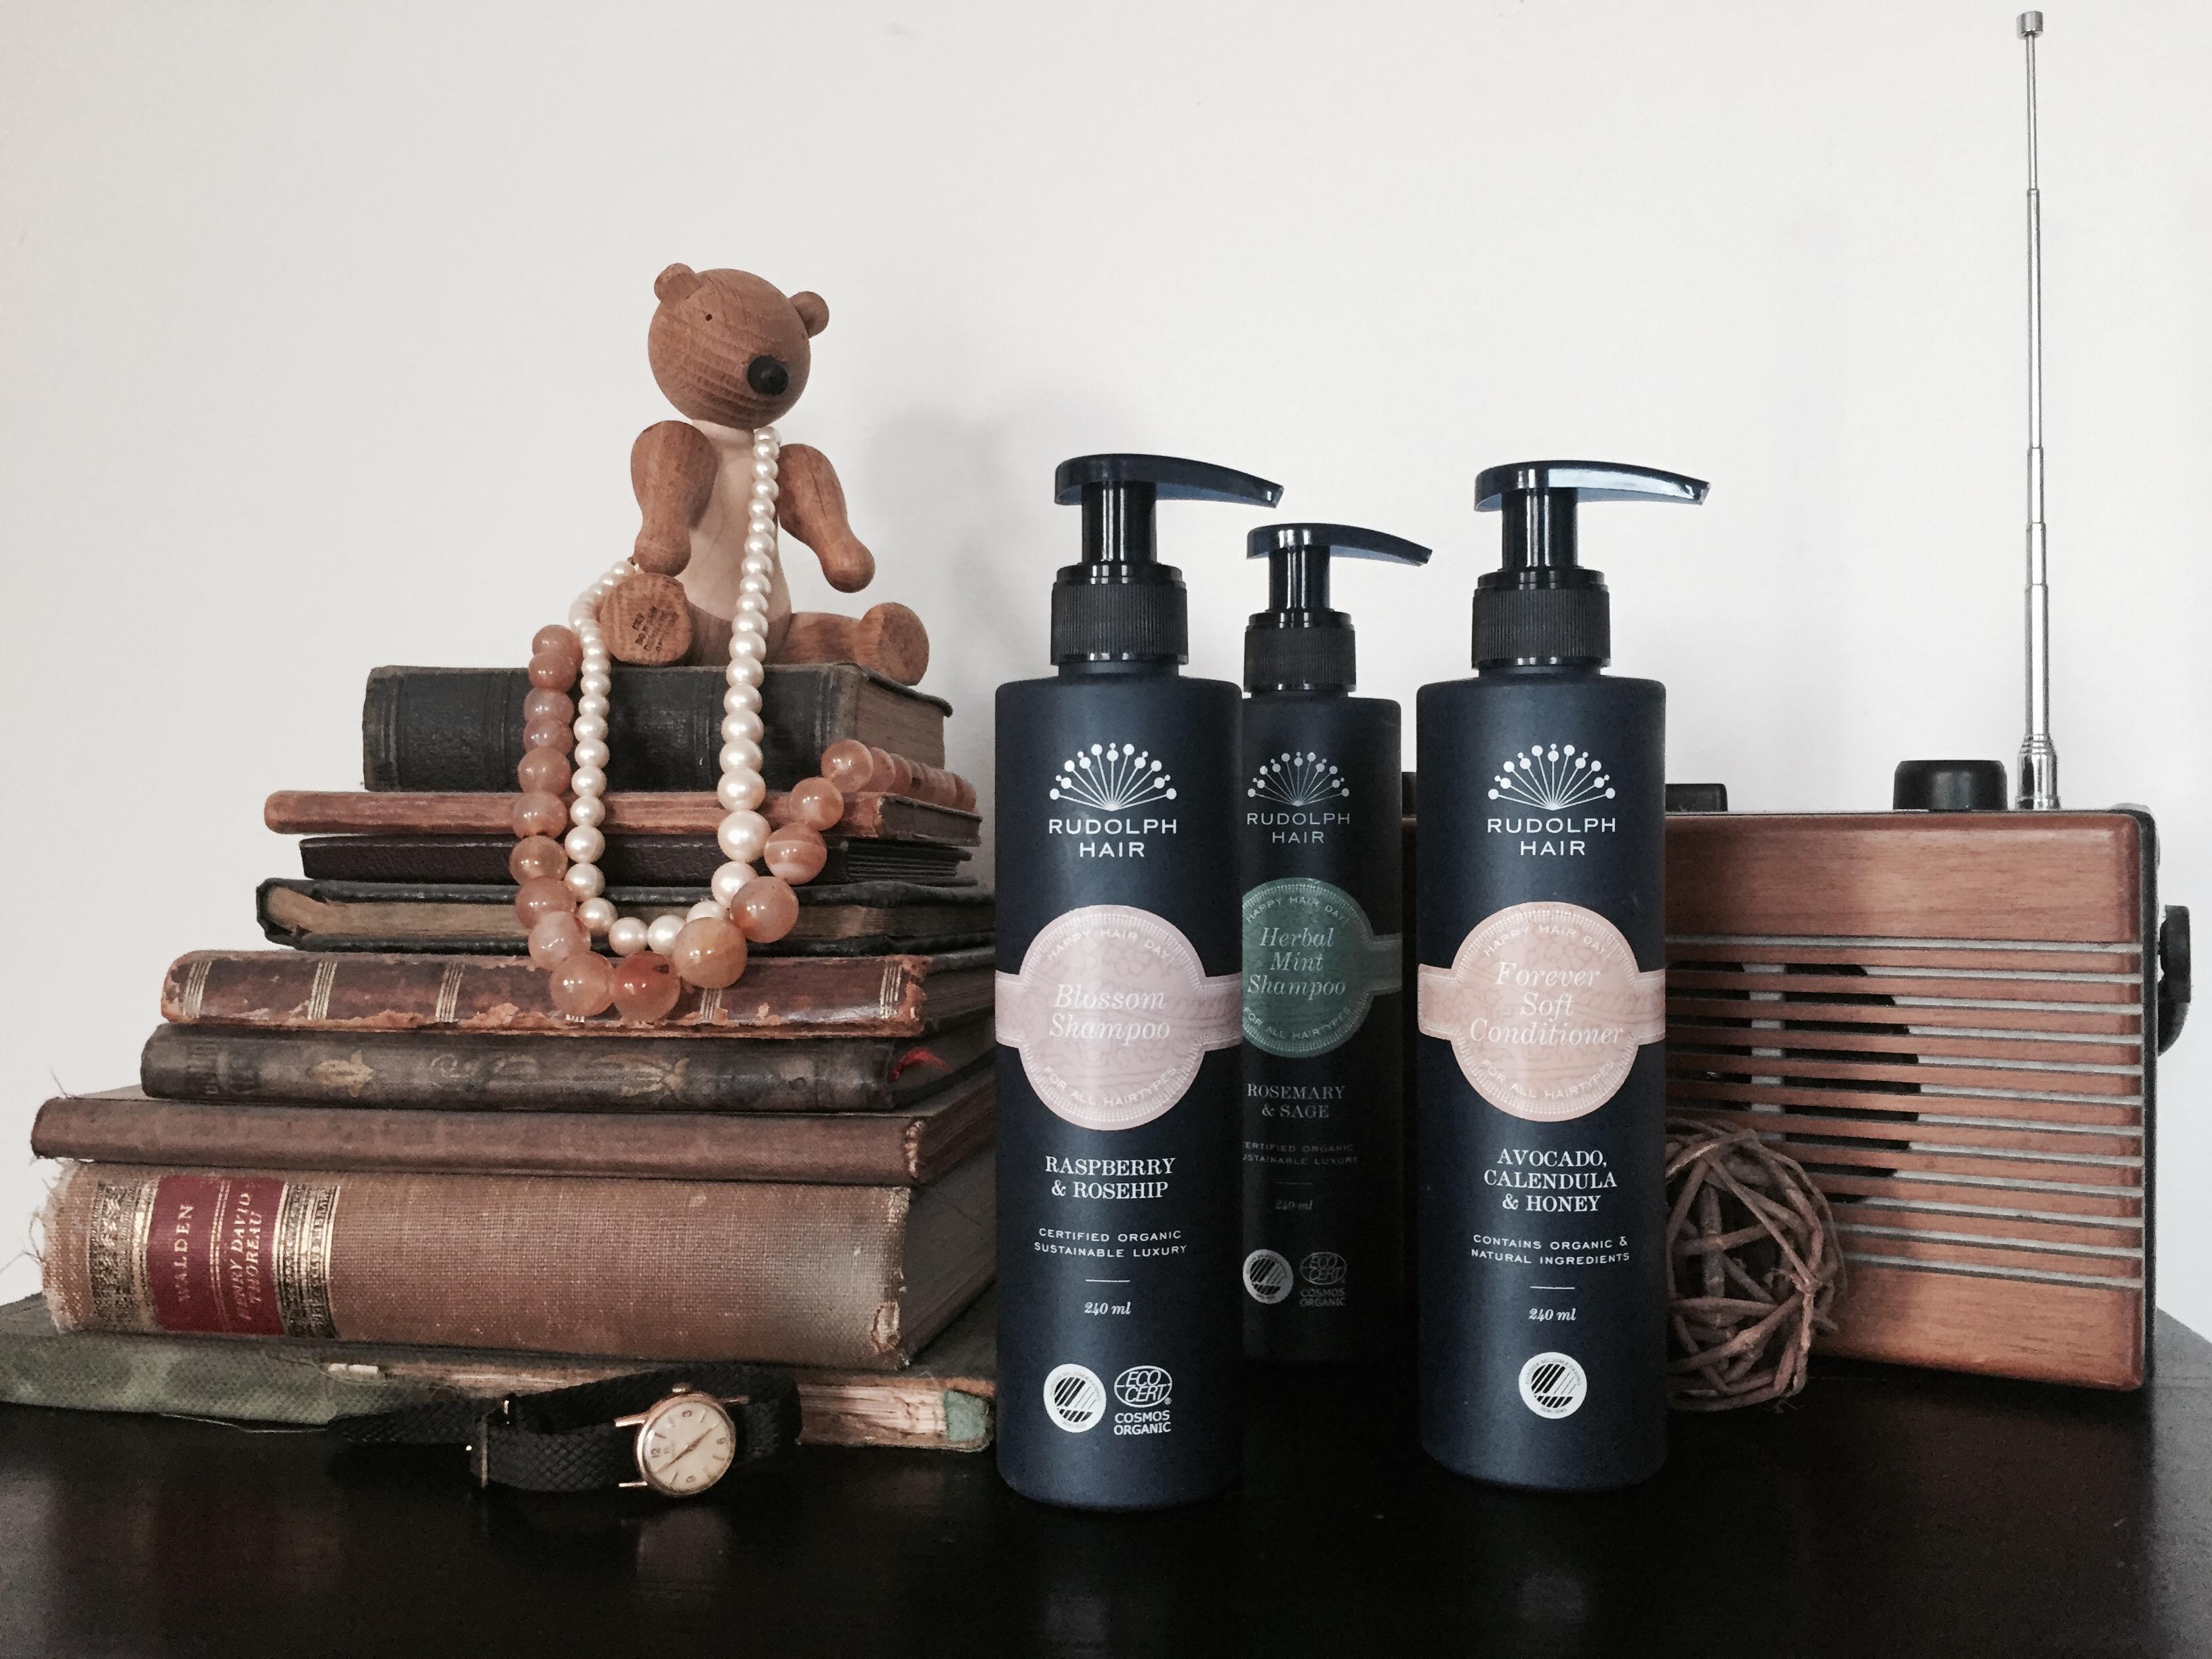 3 rene produkter og en beskidt tanke